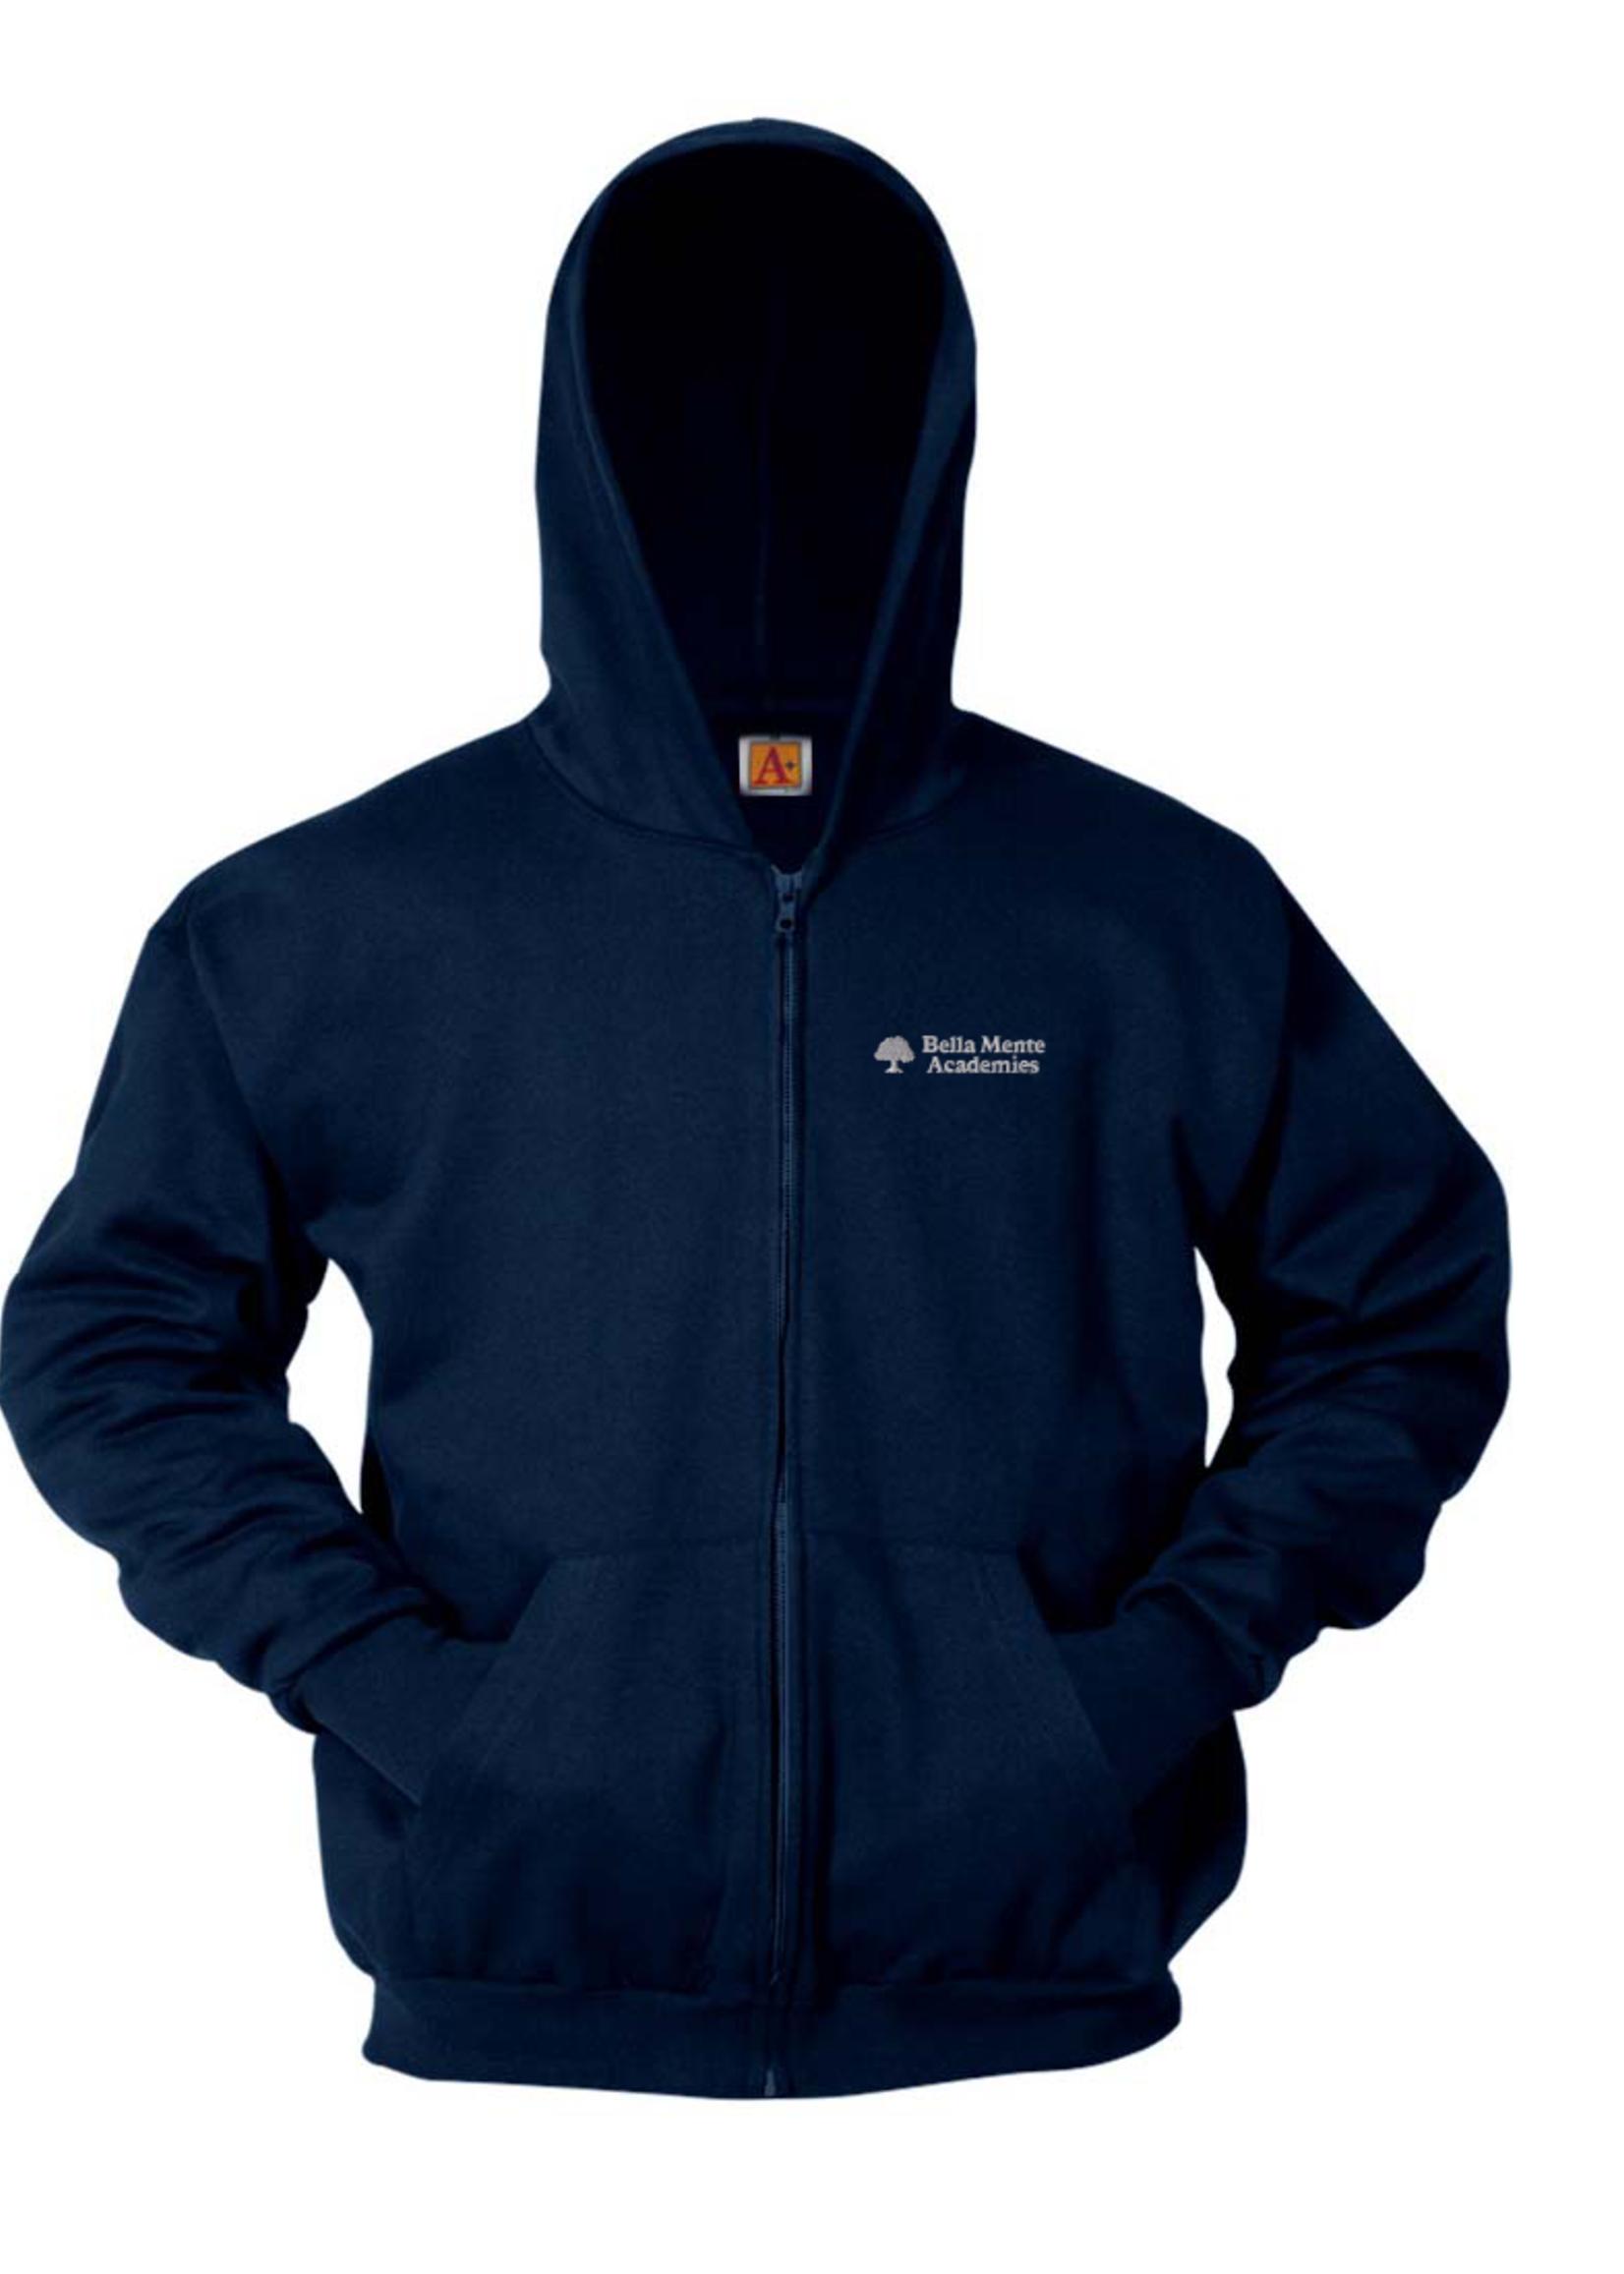 BMA Navy Hooded Full Zip Sweatshirt